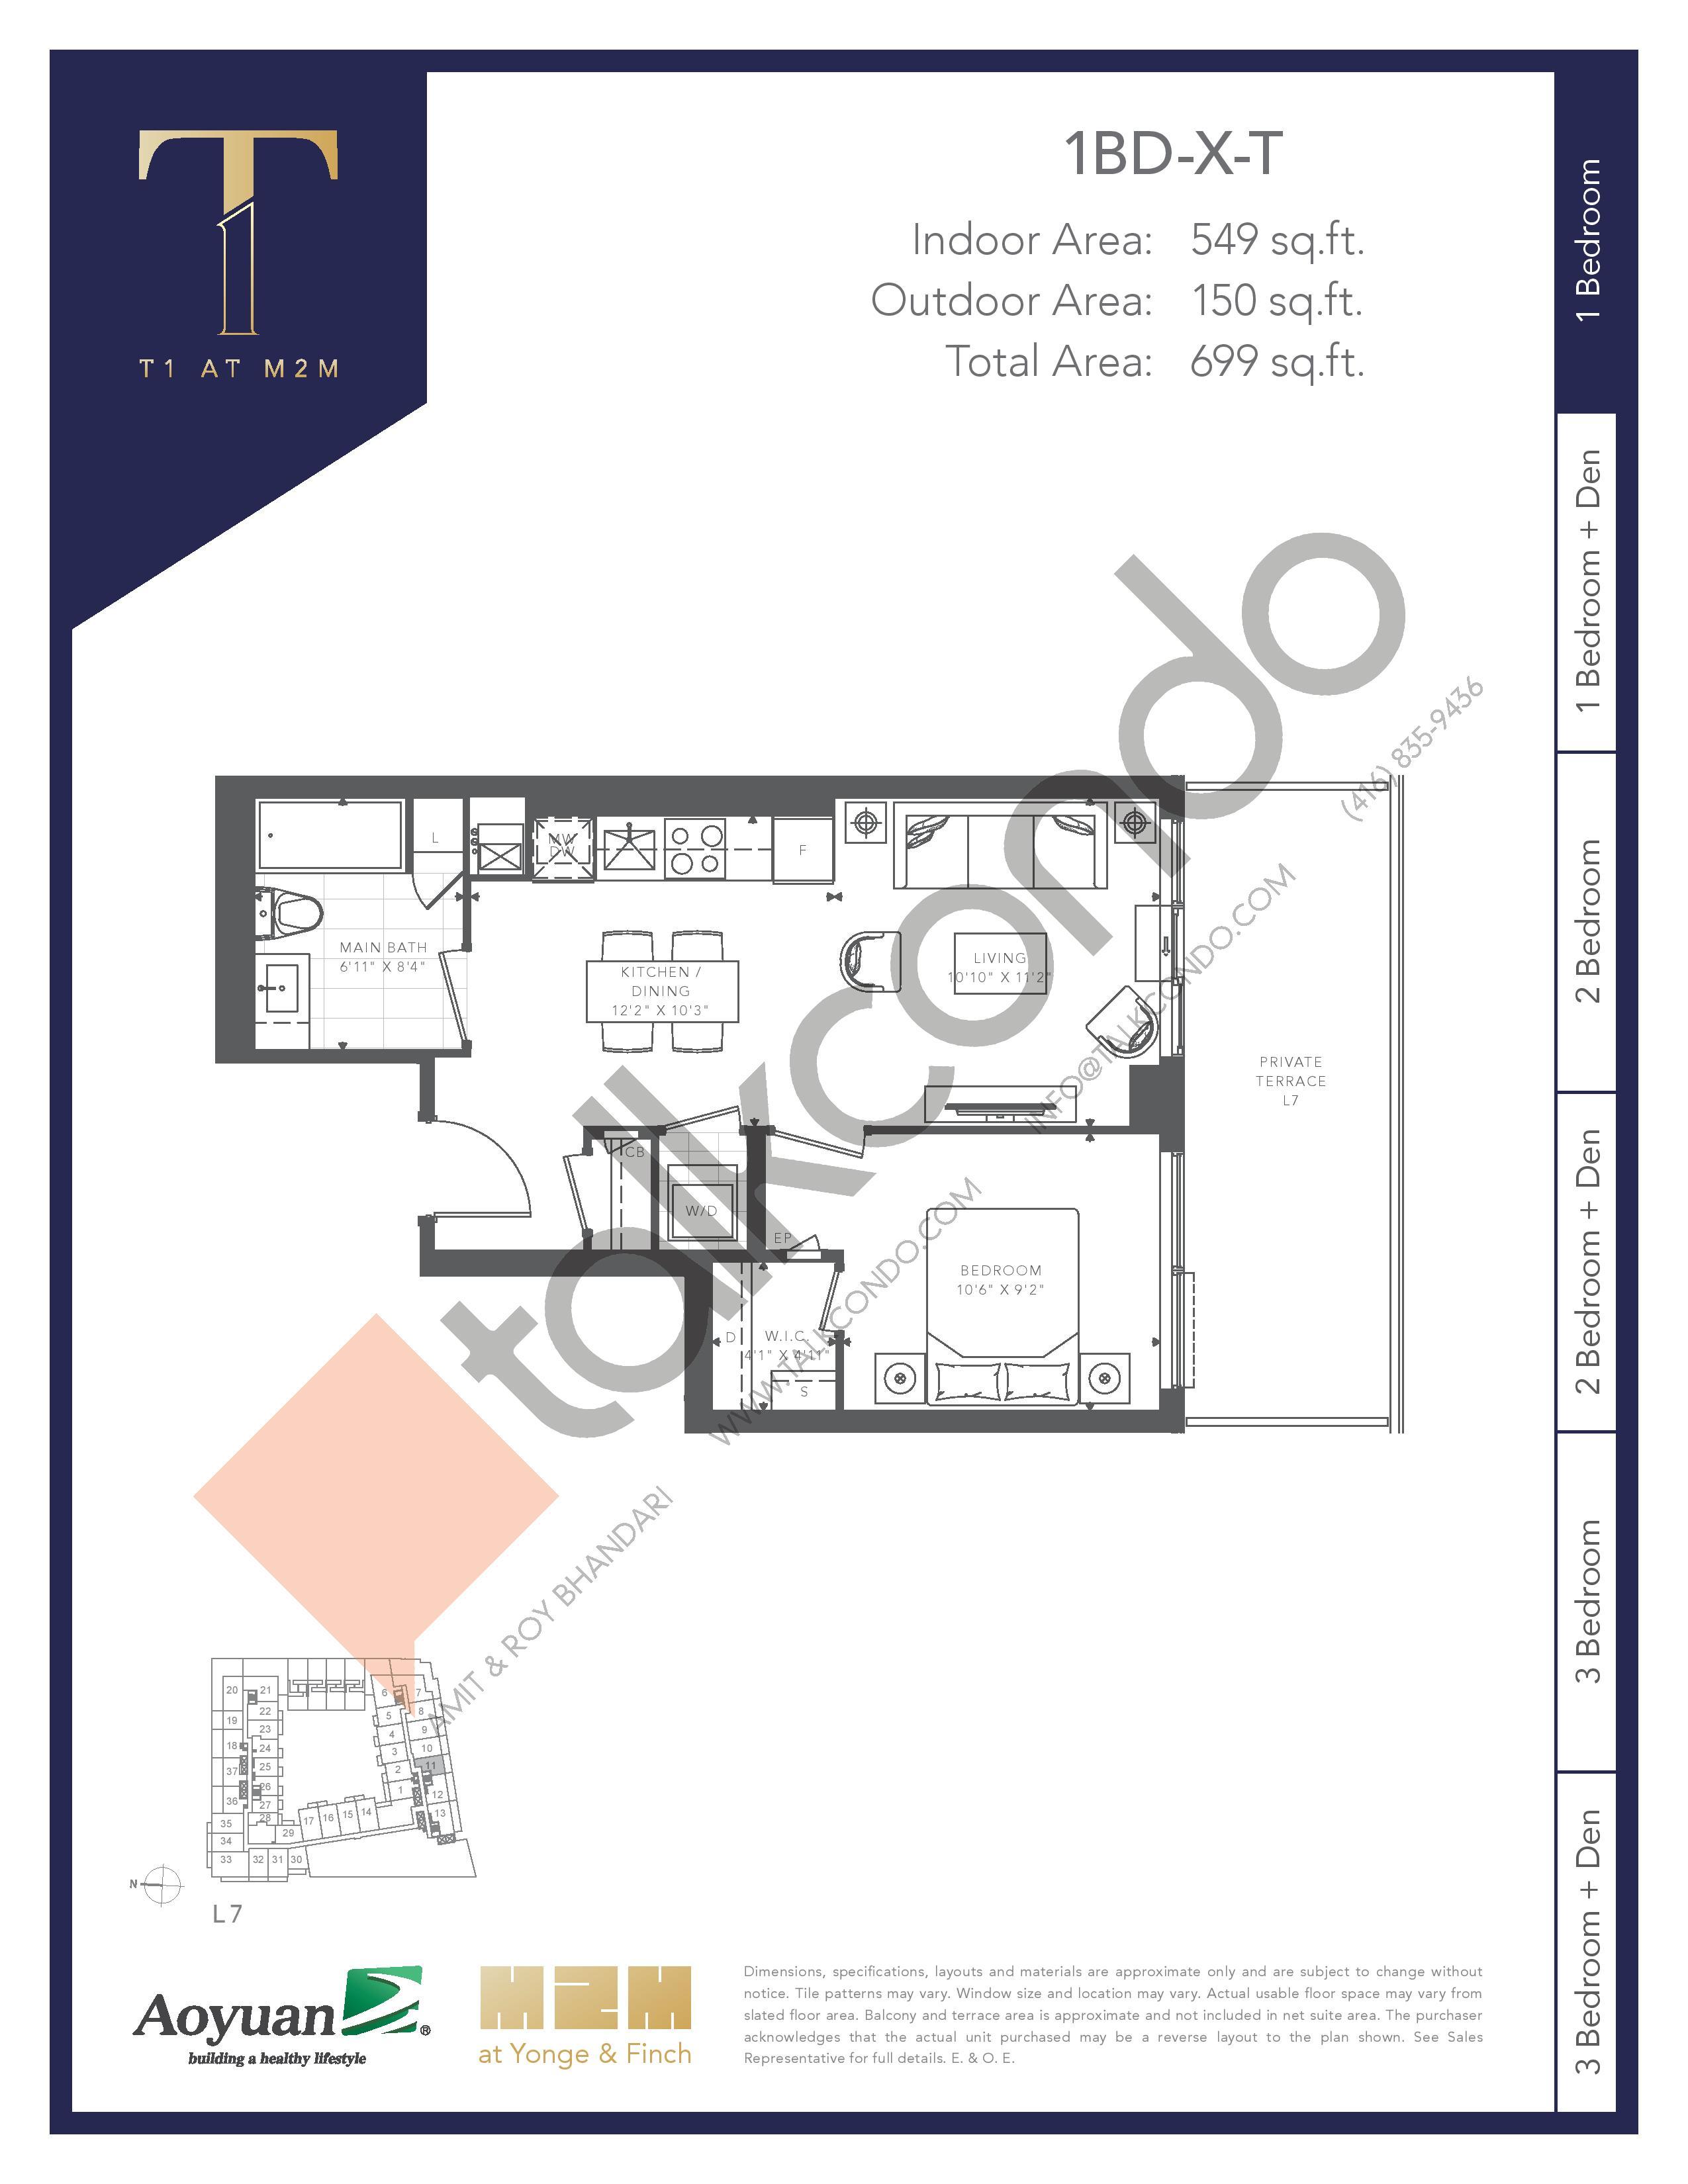 1BD-X-T Floor Plan at T1 at M2M Condos - 549 sq.ft